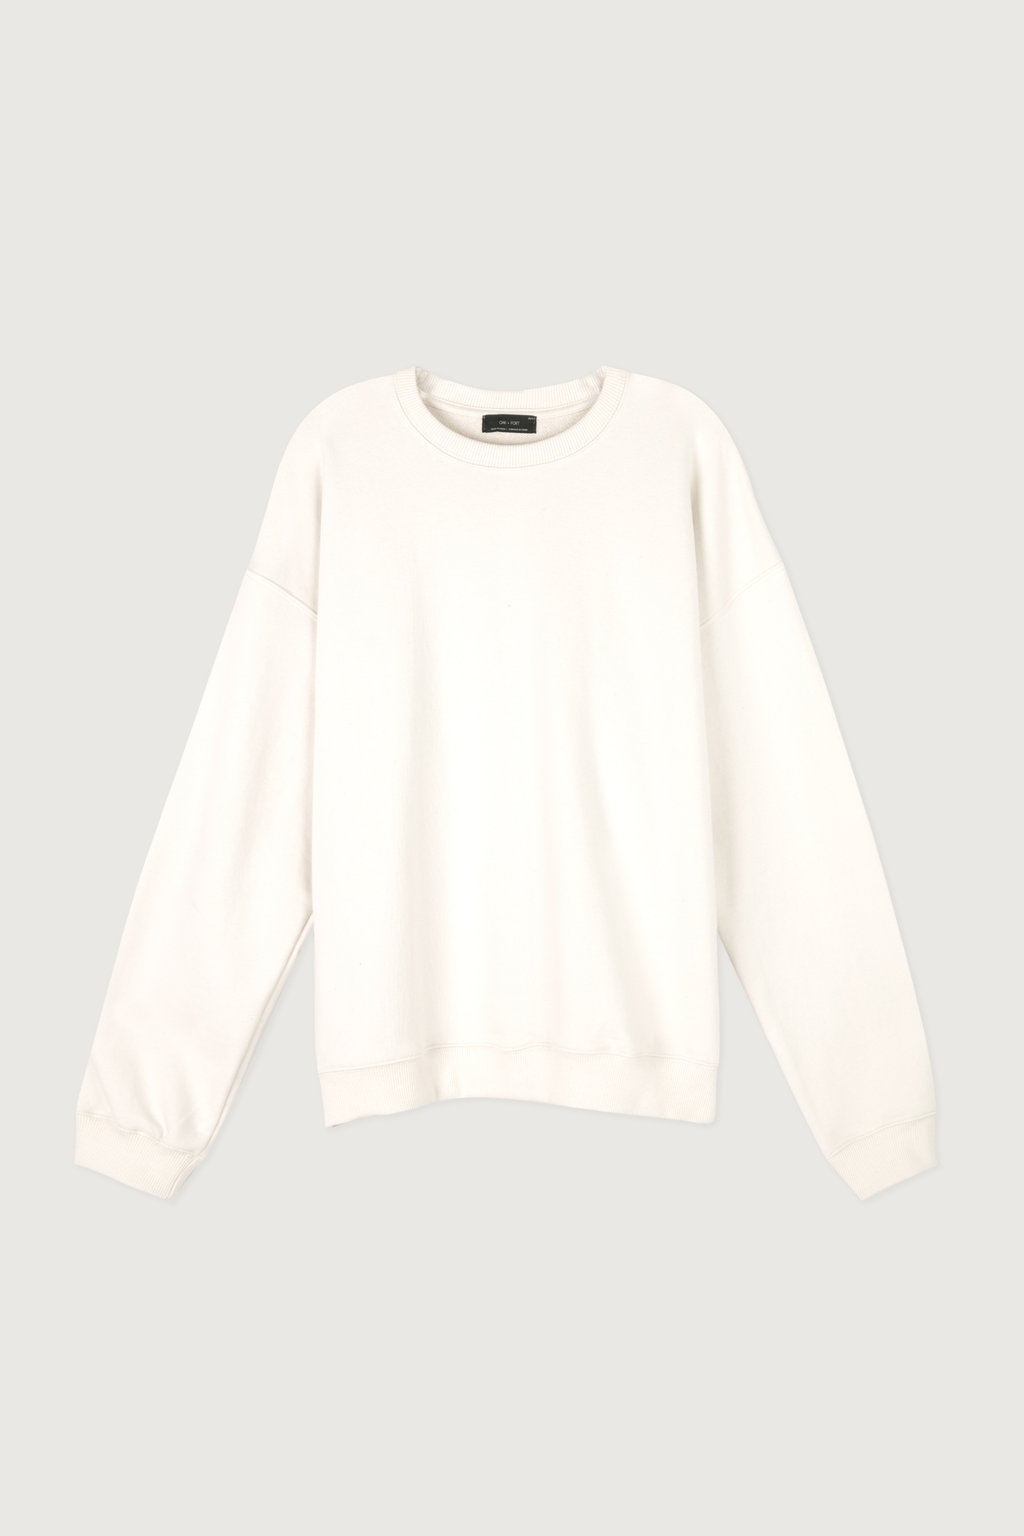 Sweatshirt K012 Cream 5